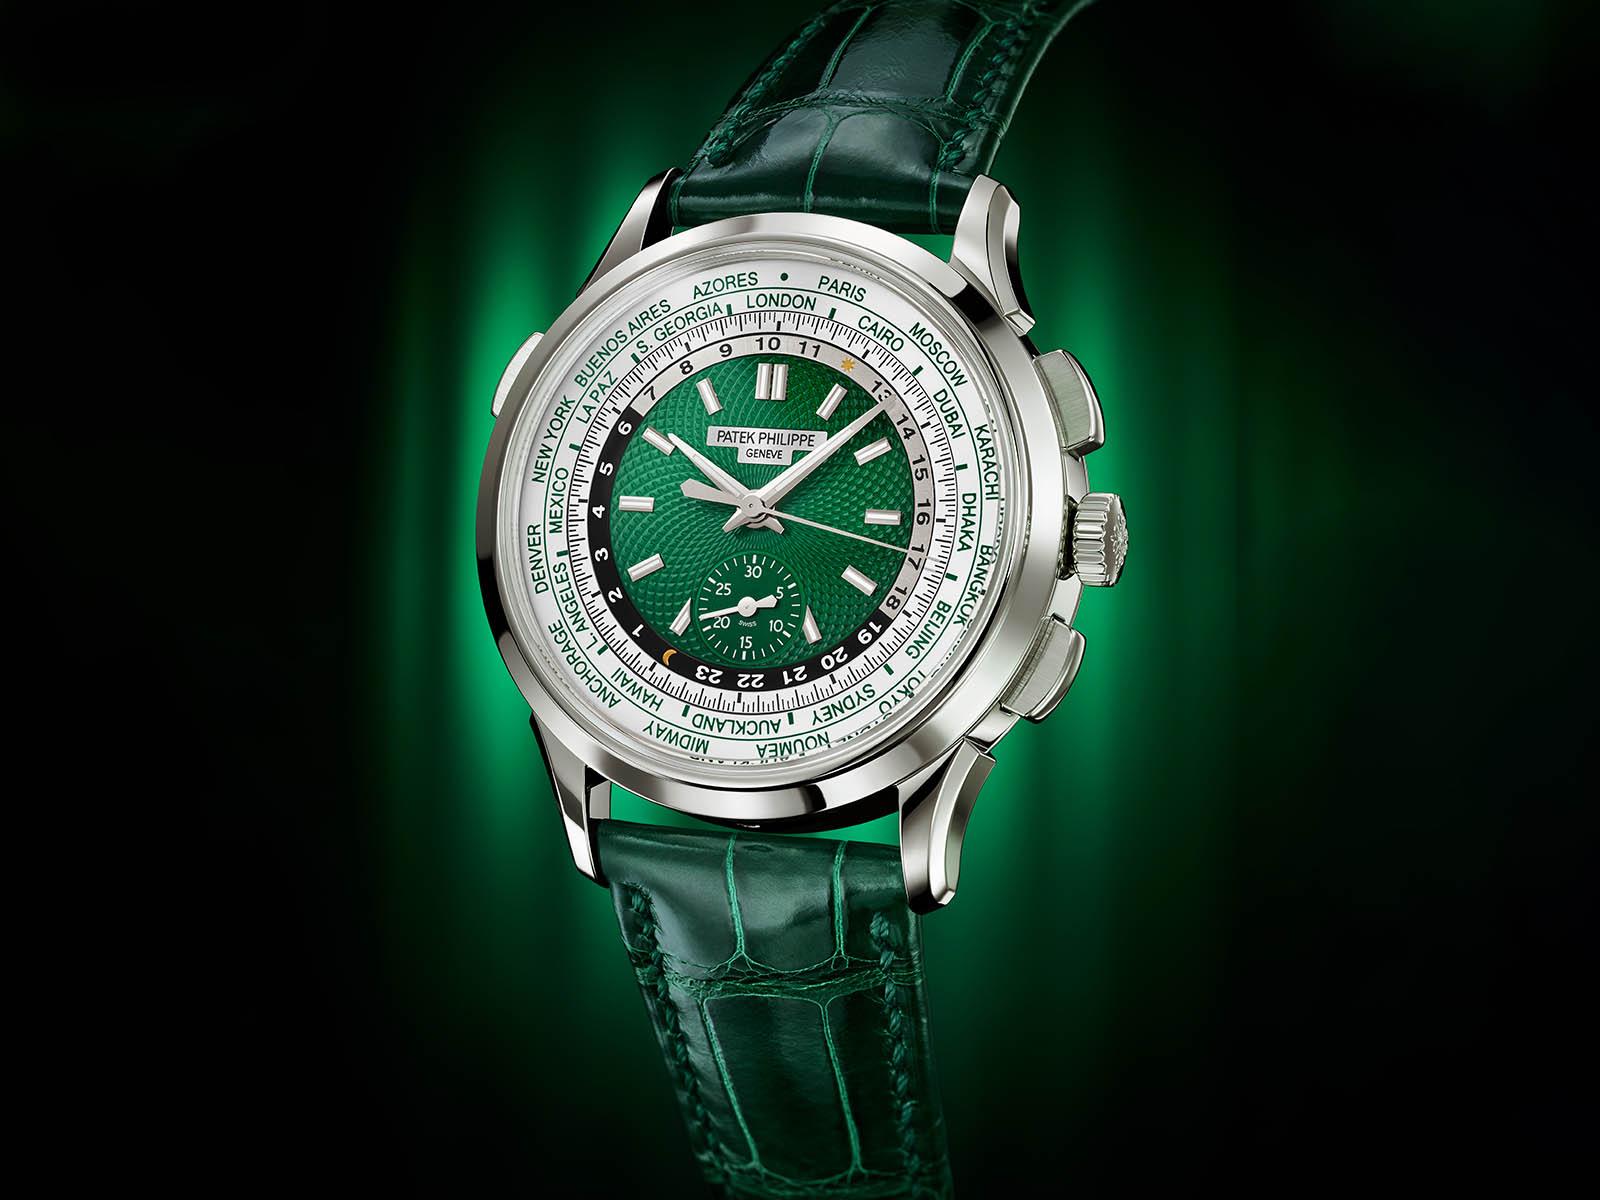 patek-philippe-new-chronograph-models-3.jpg